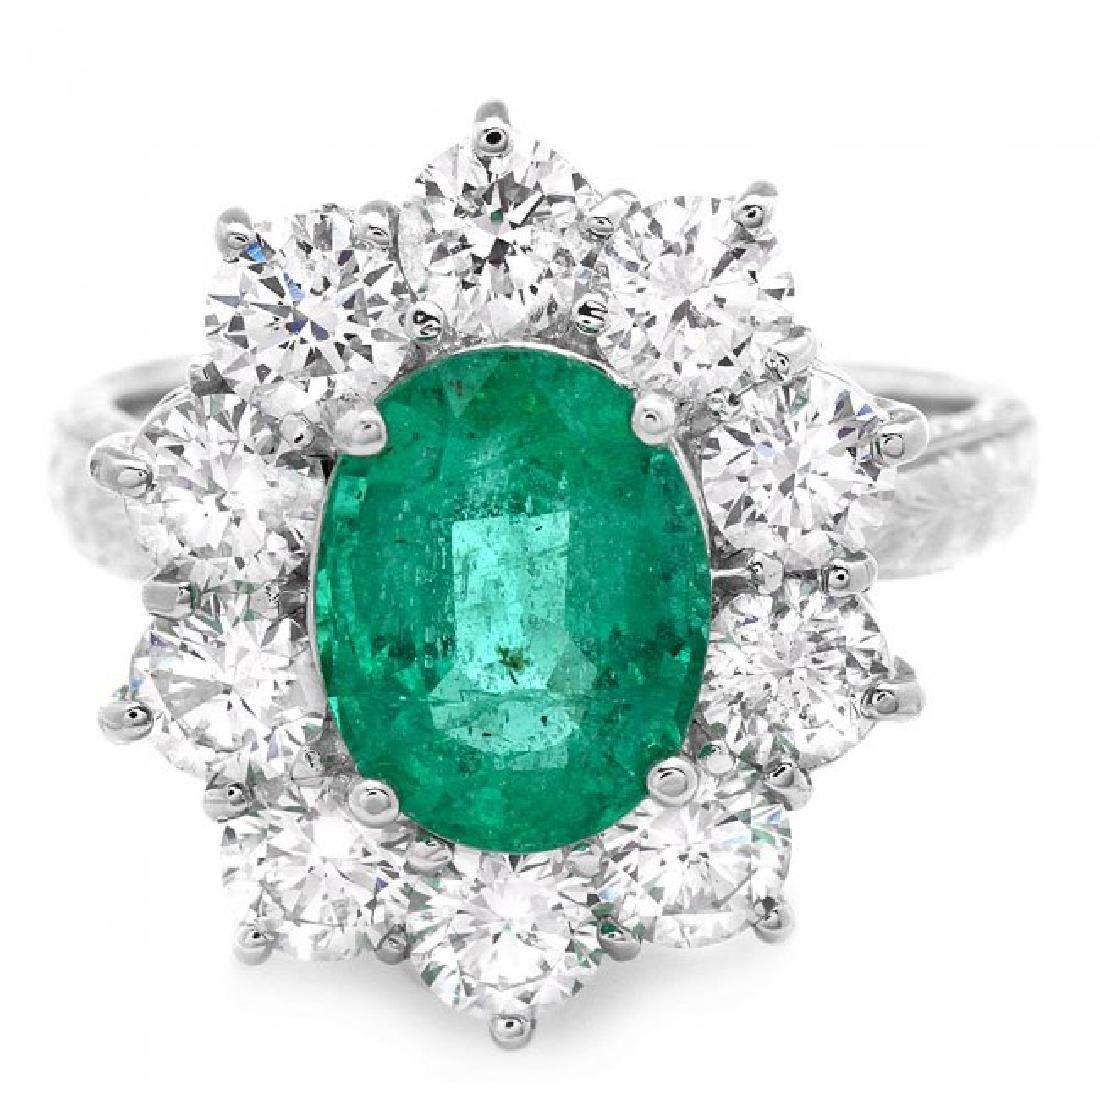 18k White Gold 2.40ct Emerald 2.15ct Diamond Ring - 2